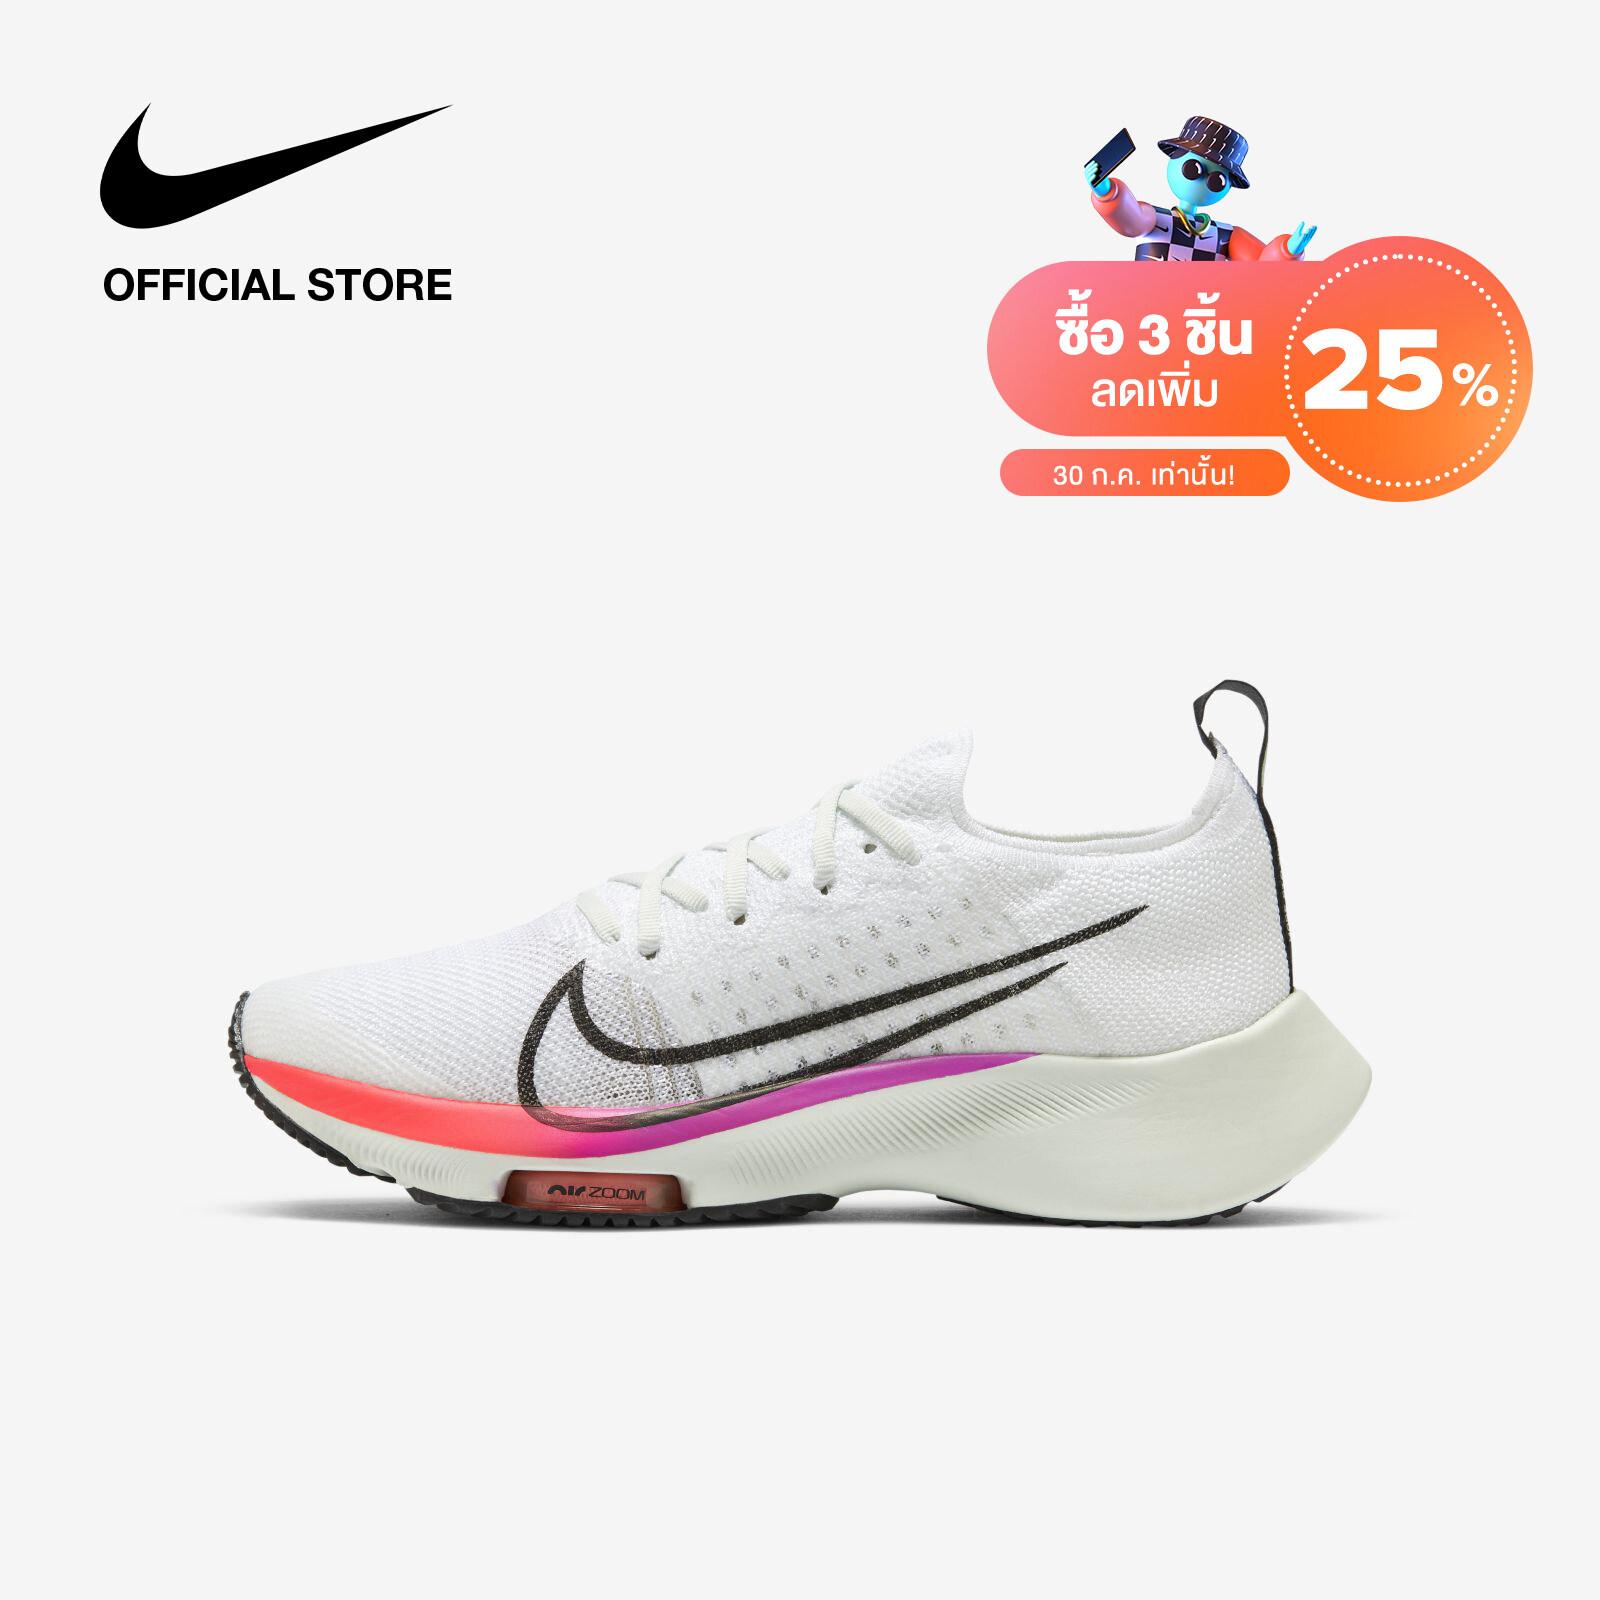 Nike Kids Air Zoom Tempo Fk Big Kids Running Shoes - White ไนกี้ รองเท้าวิ่งเด็กโต แอร์ ซูม เทมโป้ เอฟเค - สีขาว.